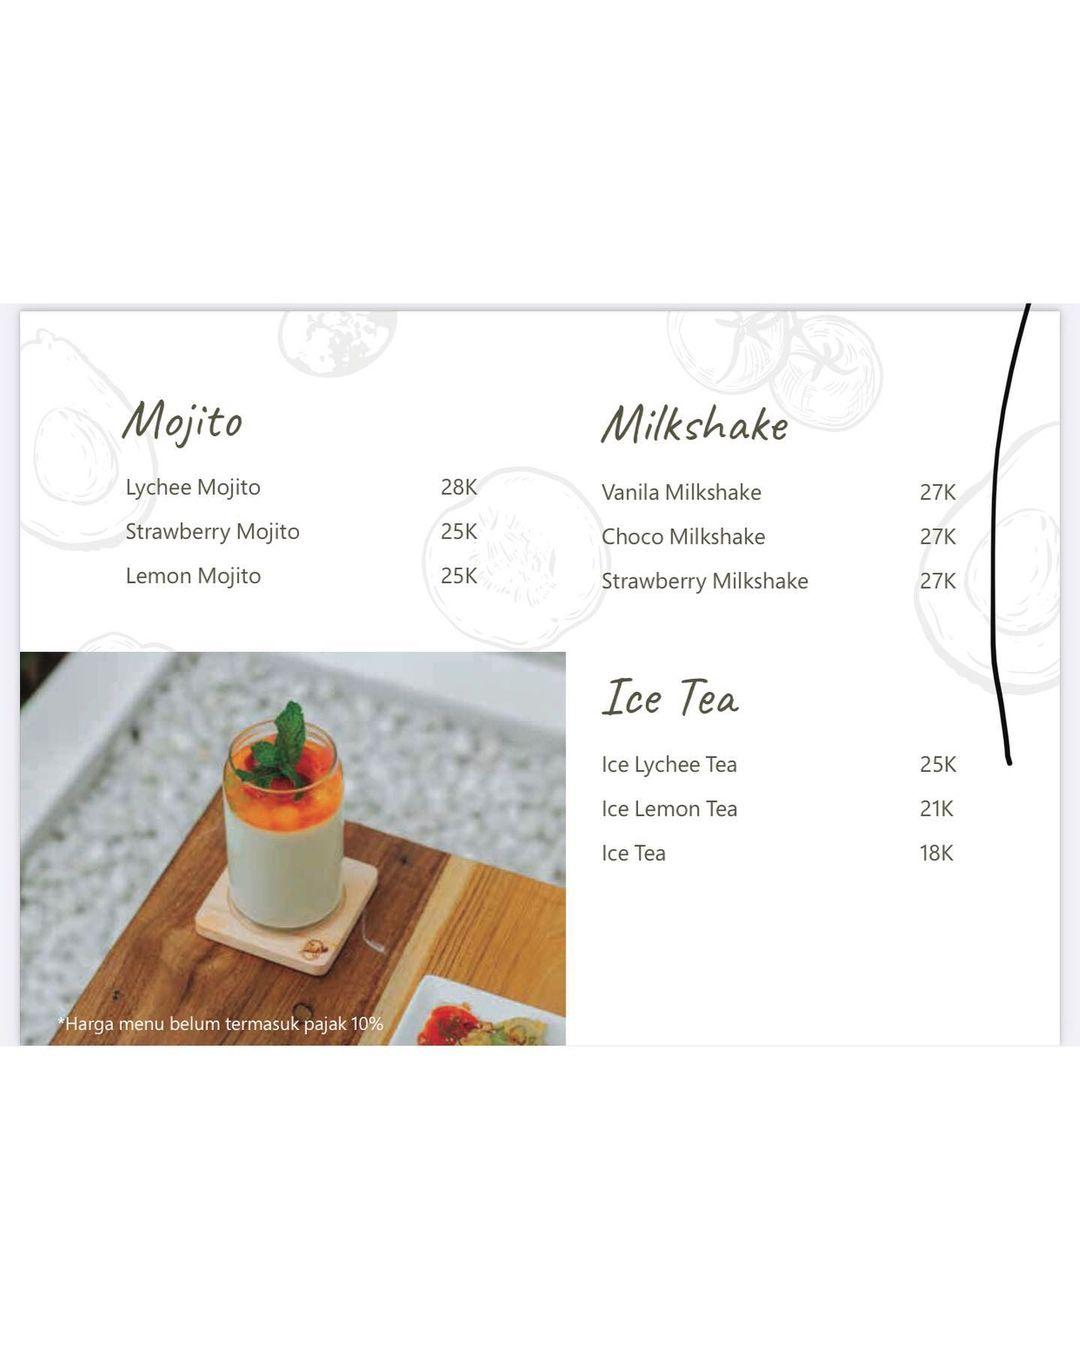 Menu Minuman 2 Padiku Eatery Image From @hargamenucek